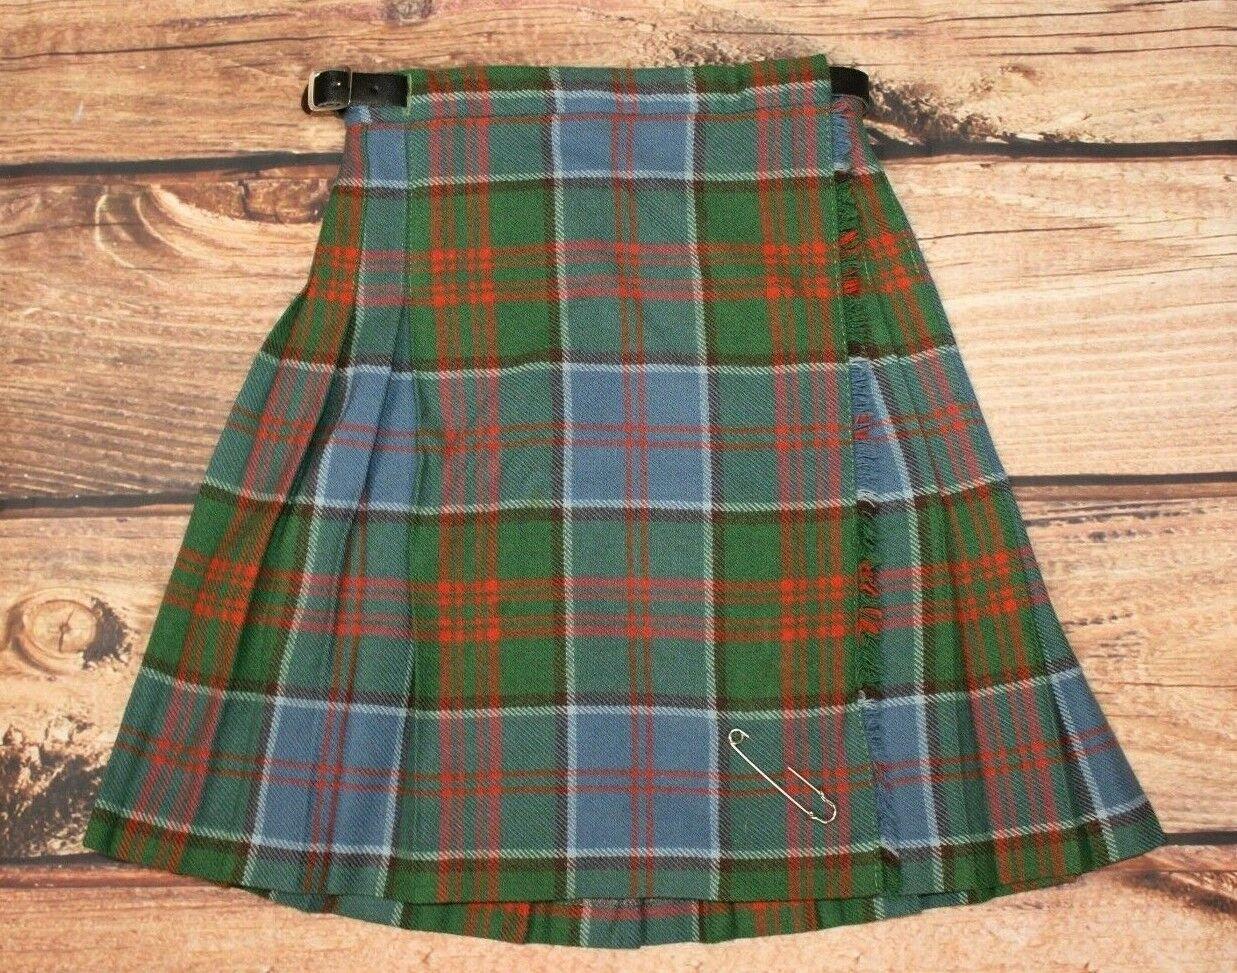 Boys Kilt Tartan Made In Pitlochry Scotland 100% Wool 6- 8 Years